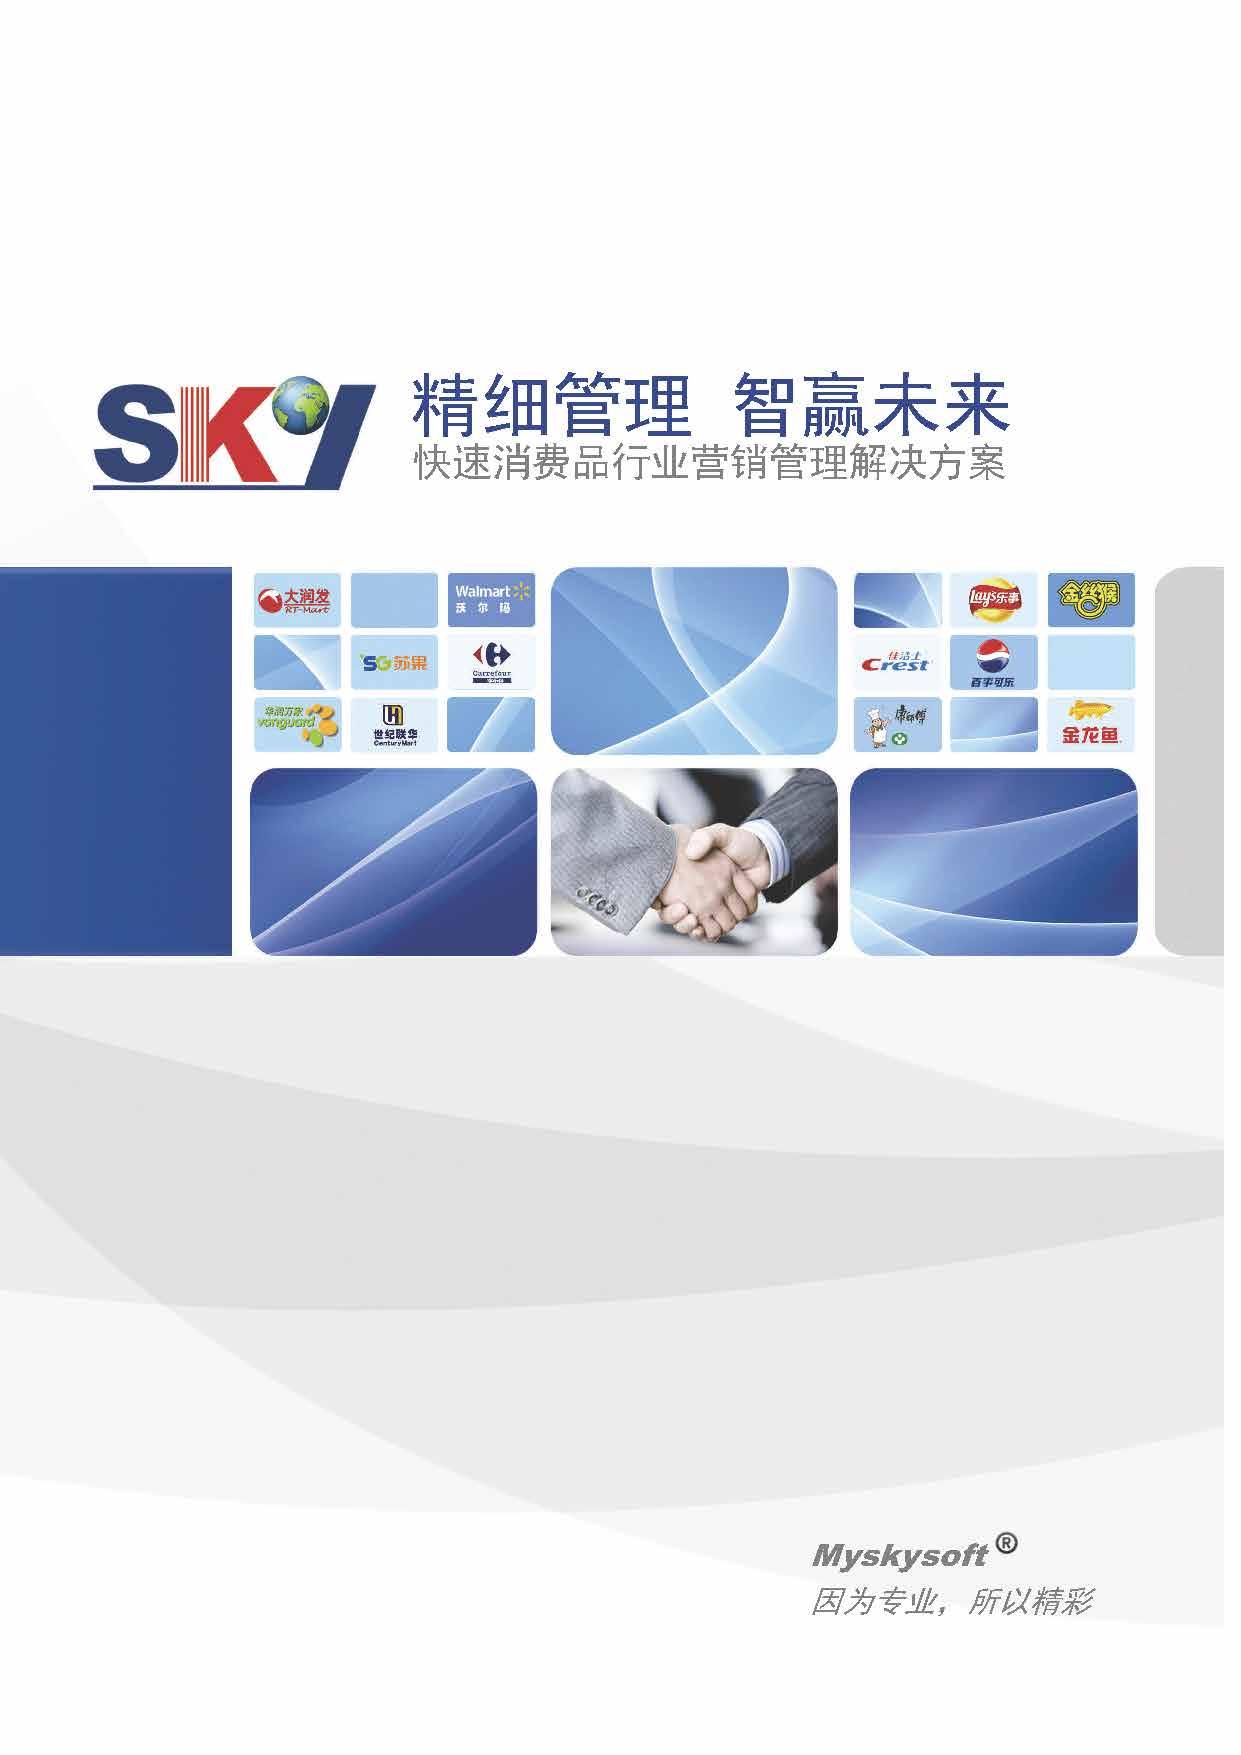 Skysoft-精细管理智赢未来